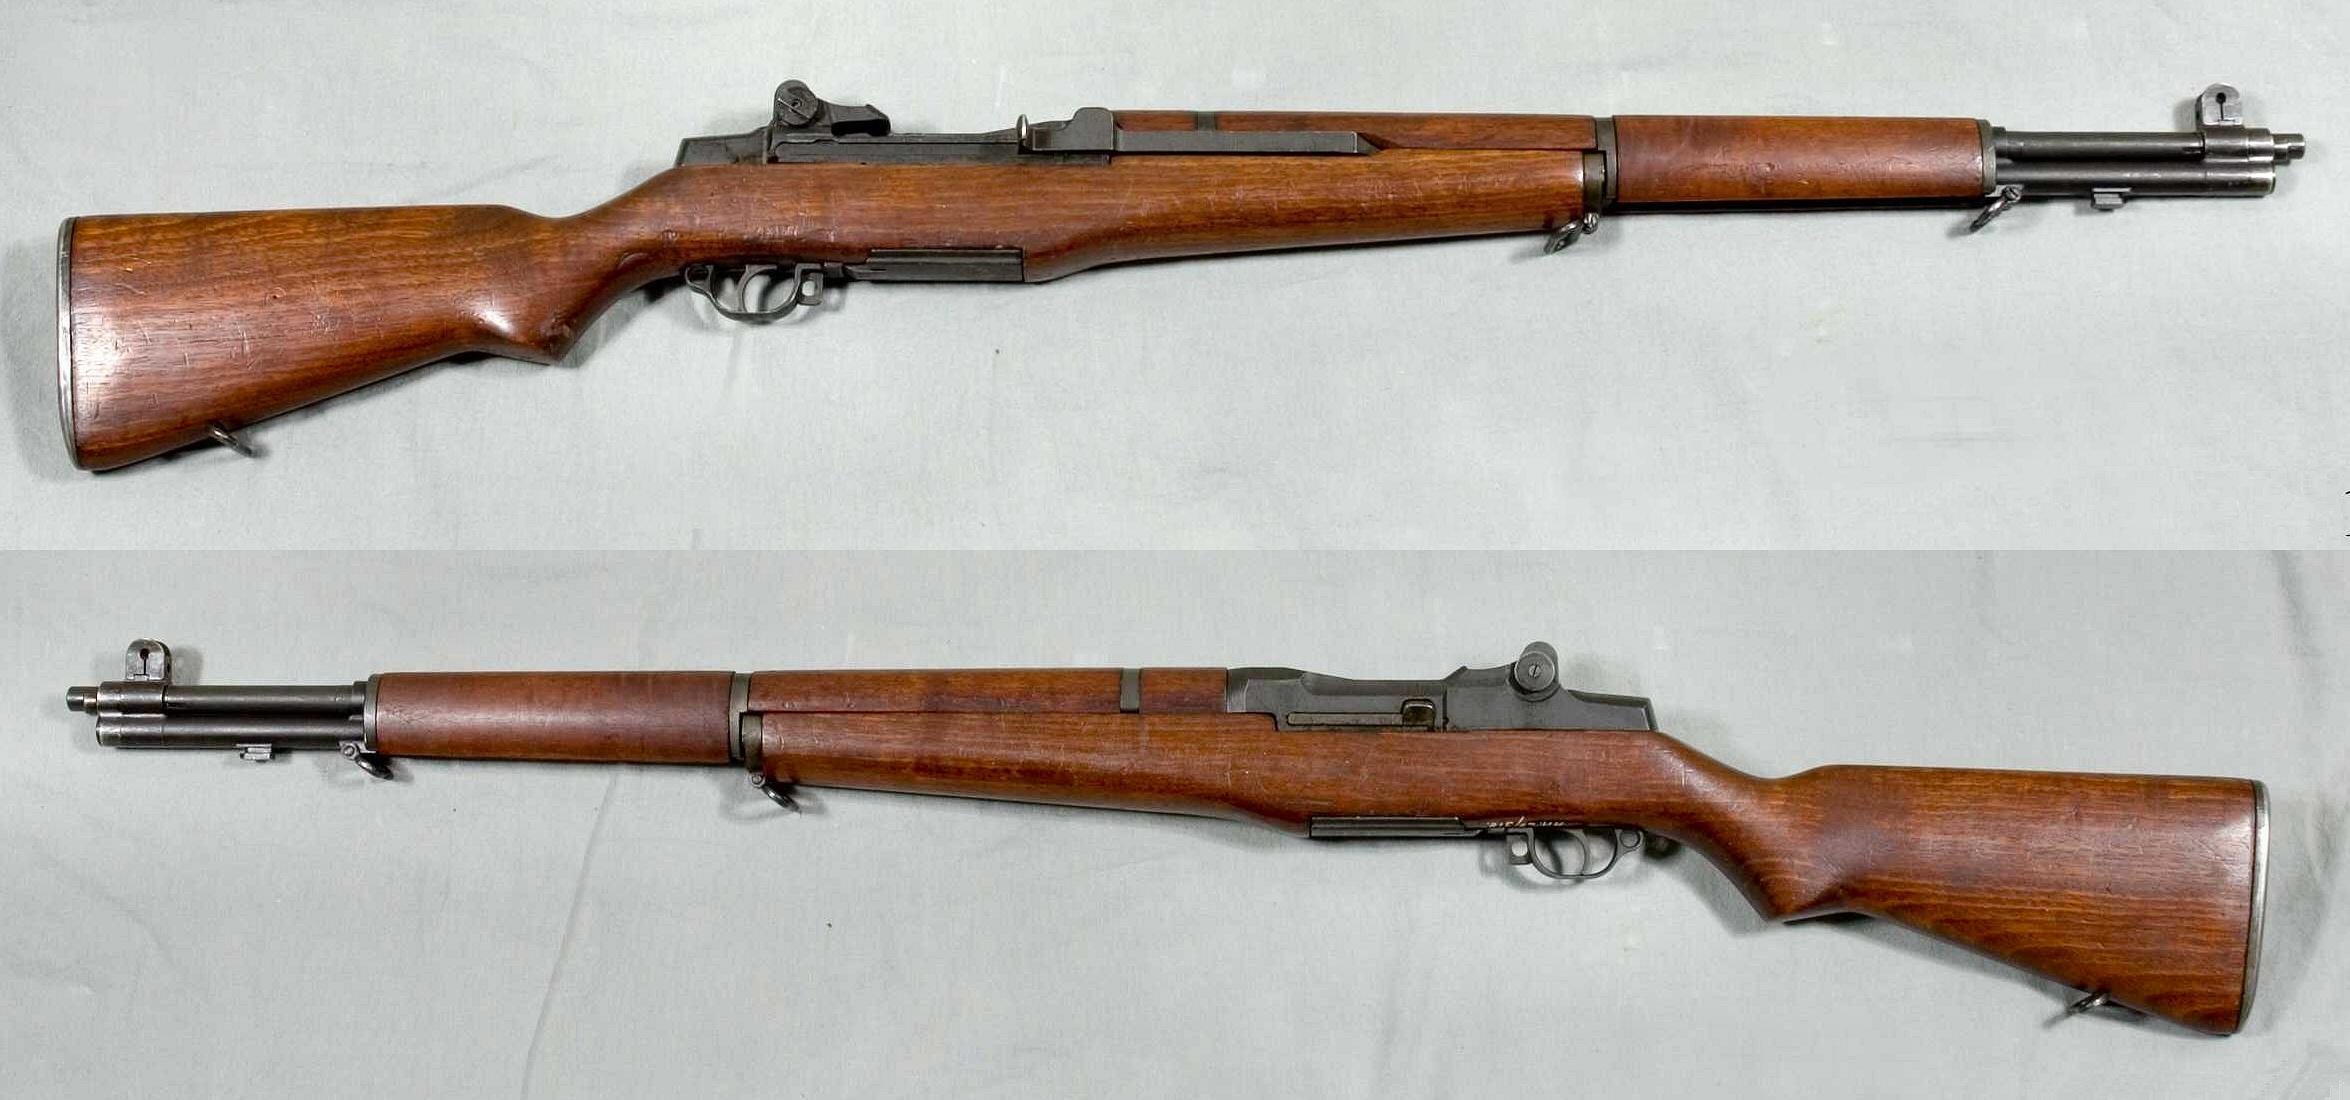 [Image: M1_Garand_rifle_-_USA_-_30-06_-_Arm%C3%A9museum.jpg]